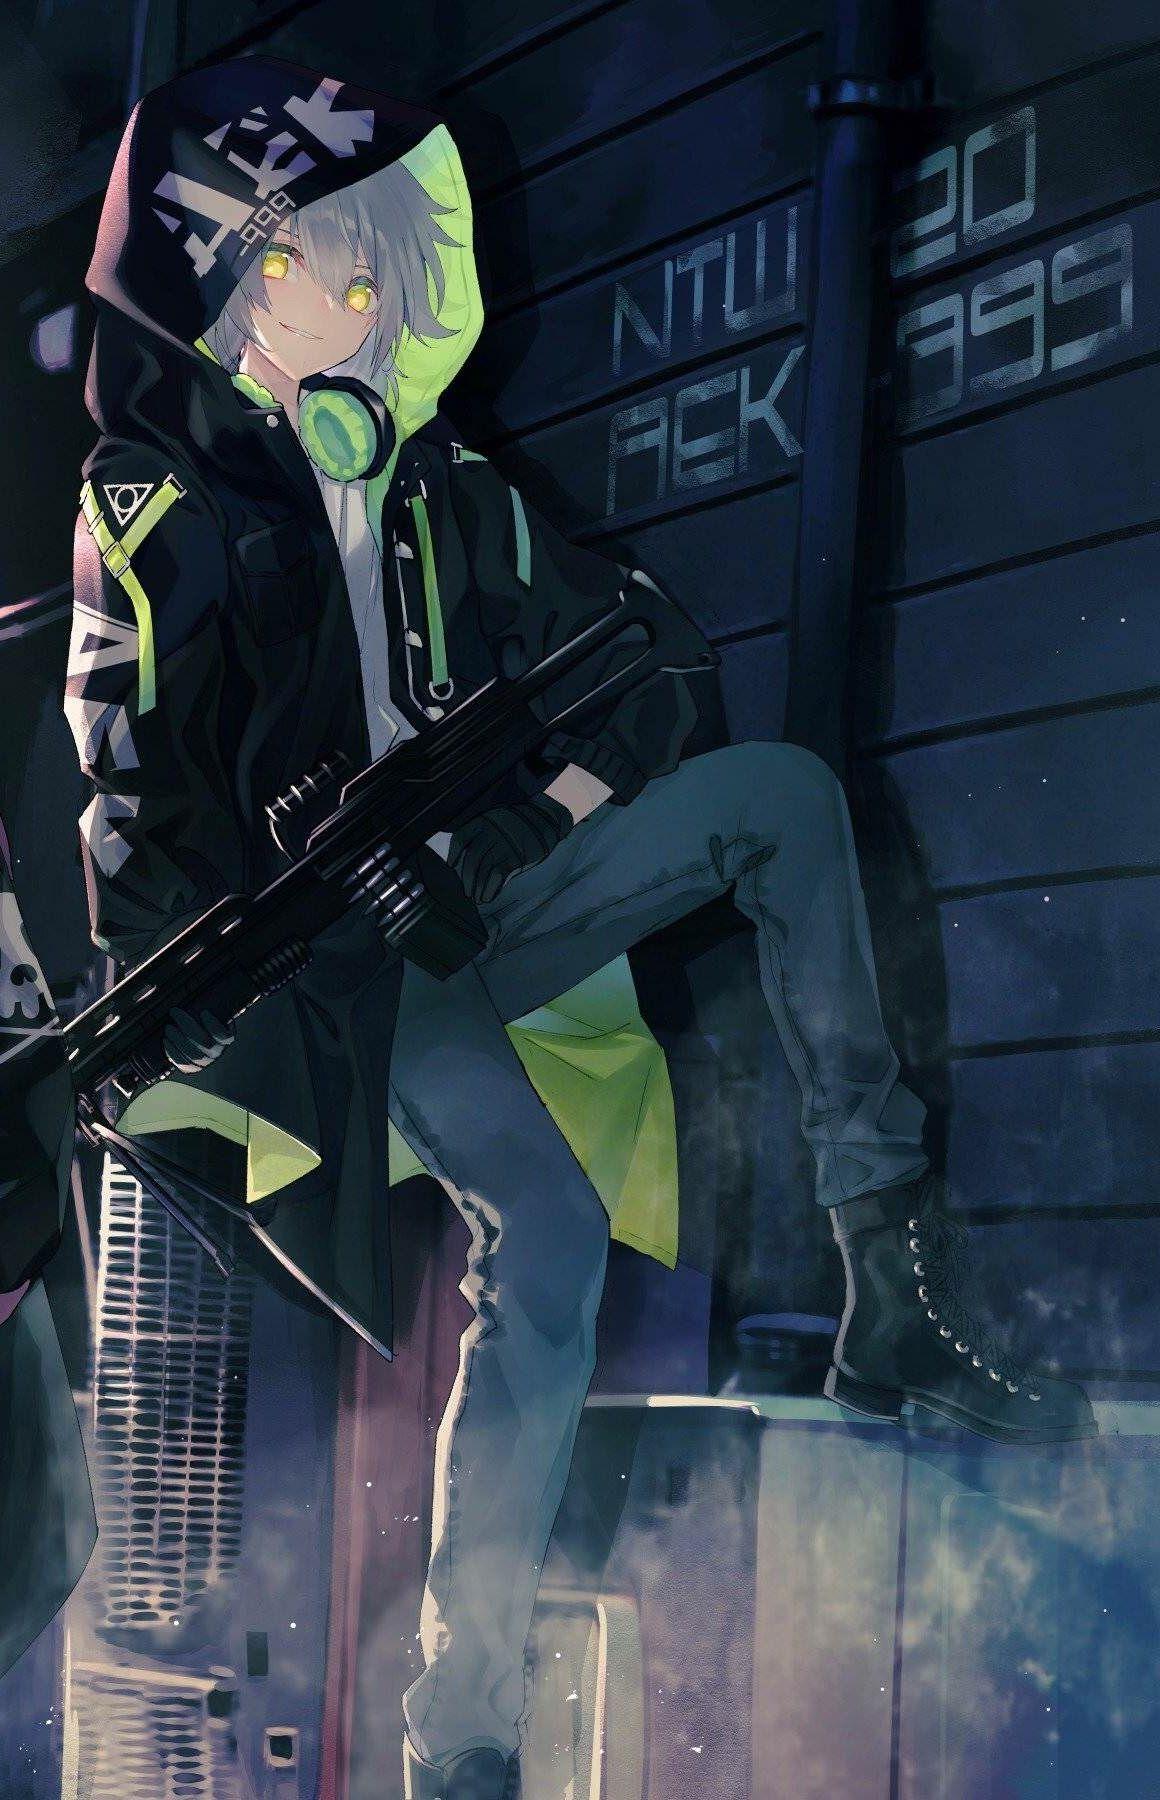 Anime boys with guns wallpaper